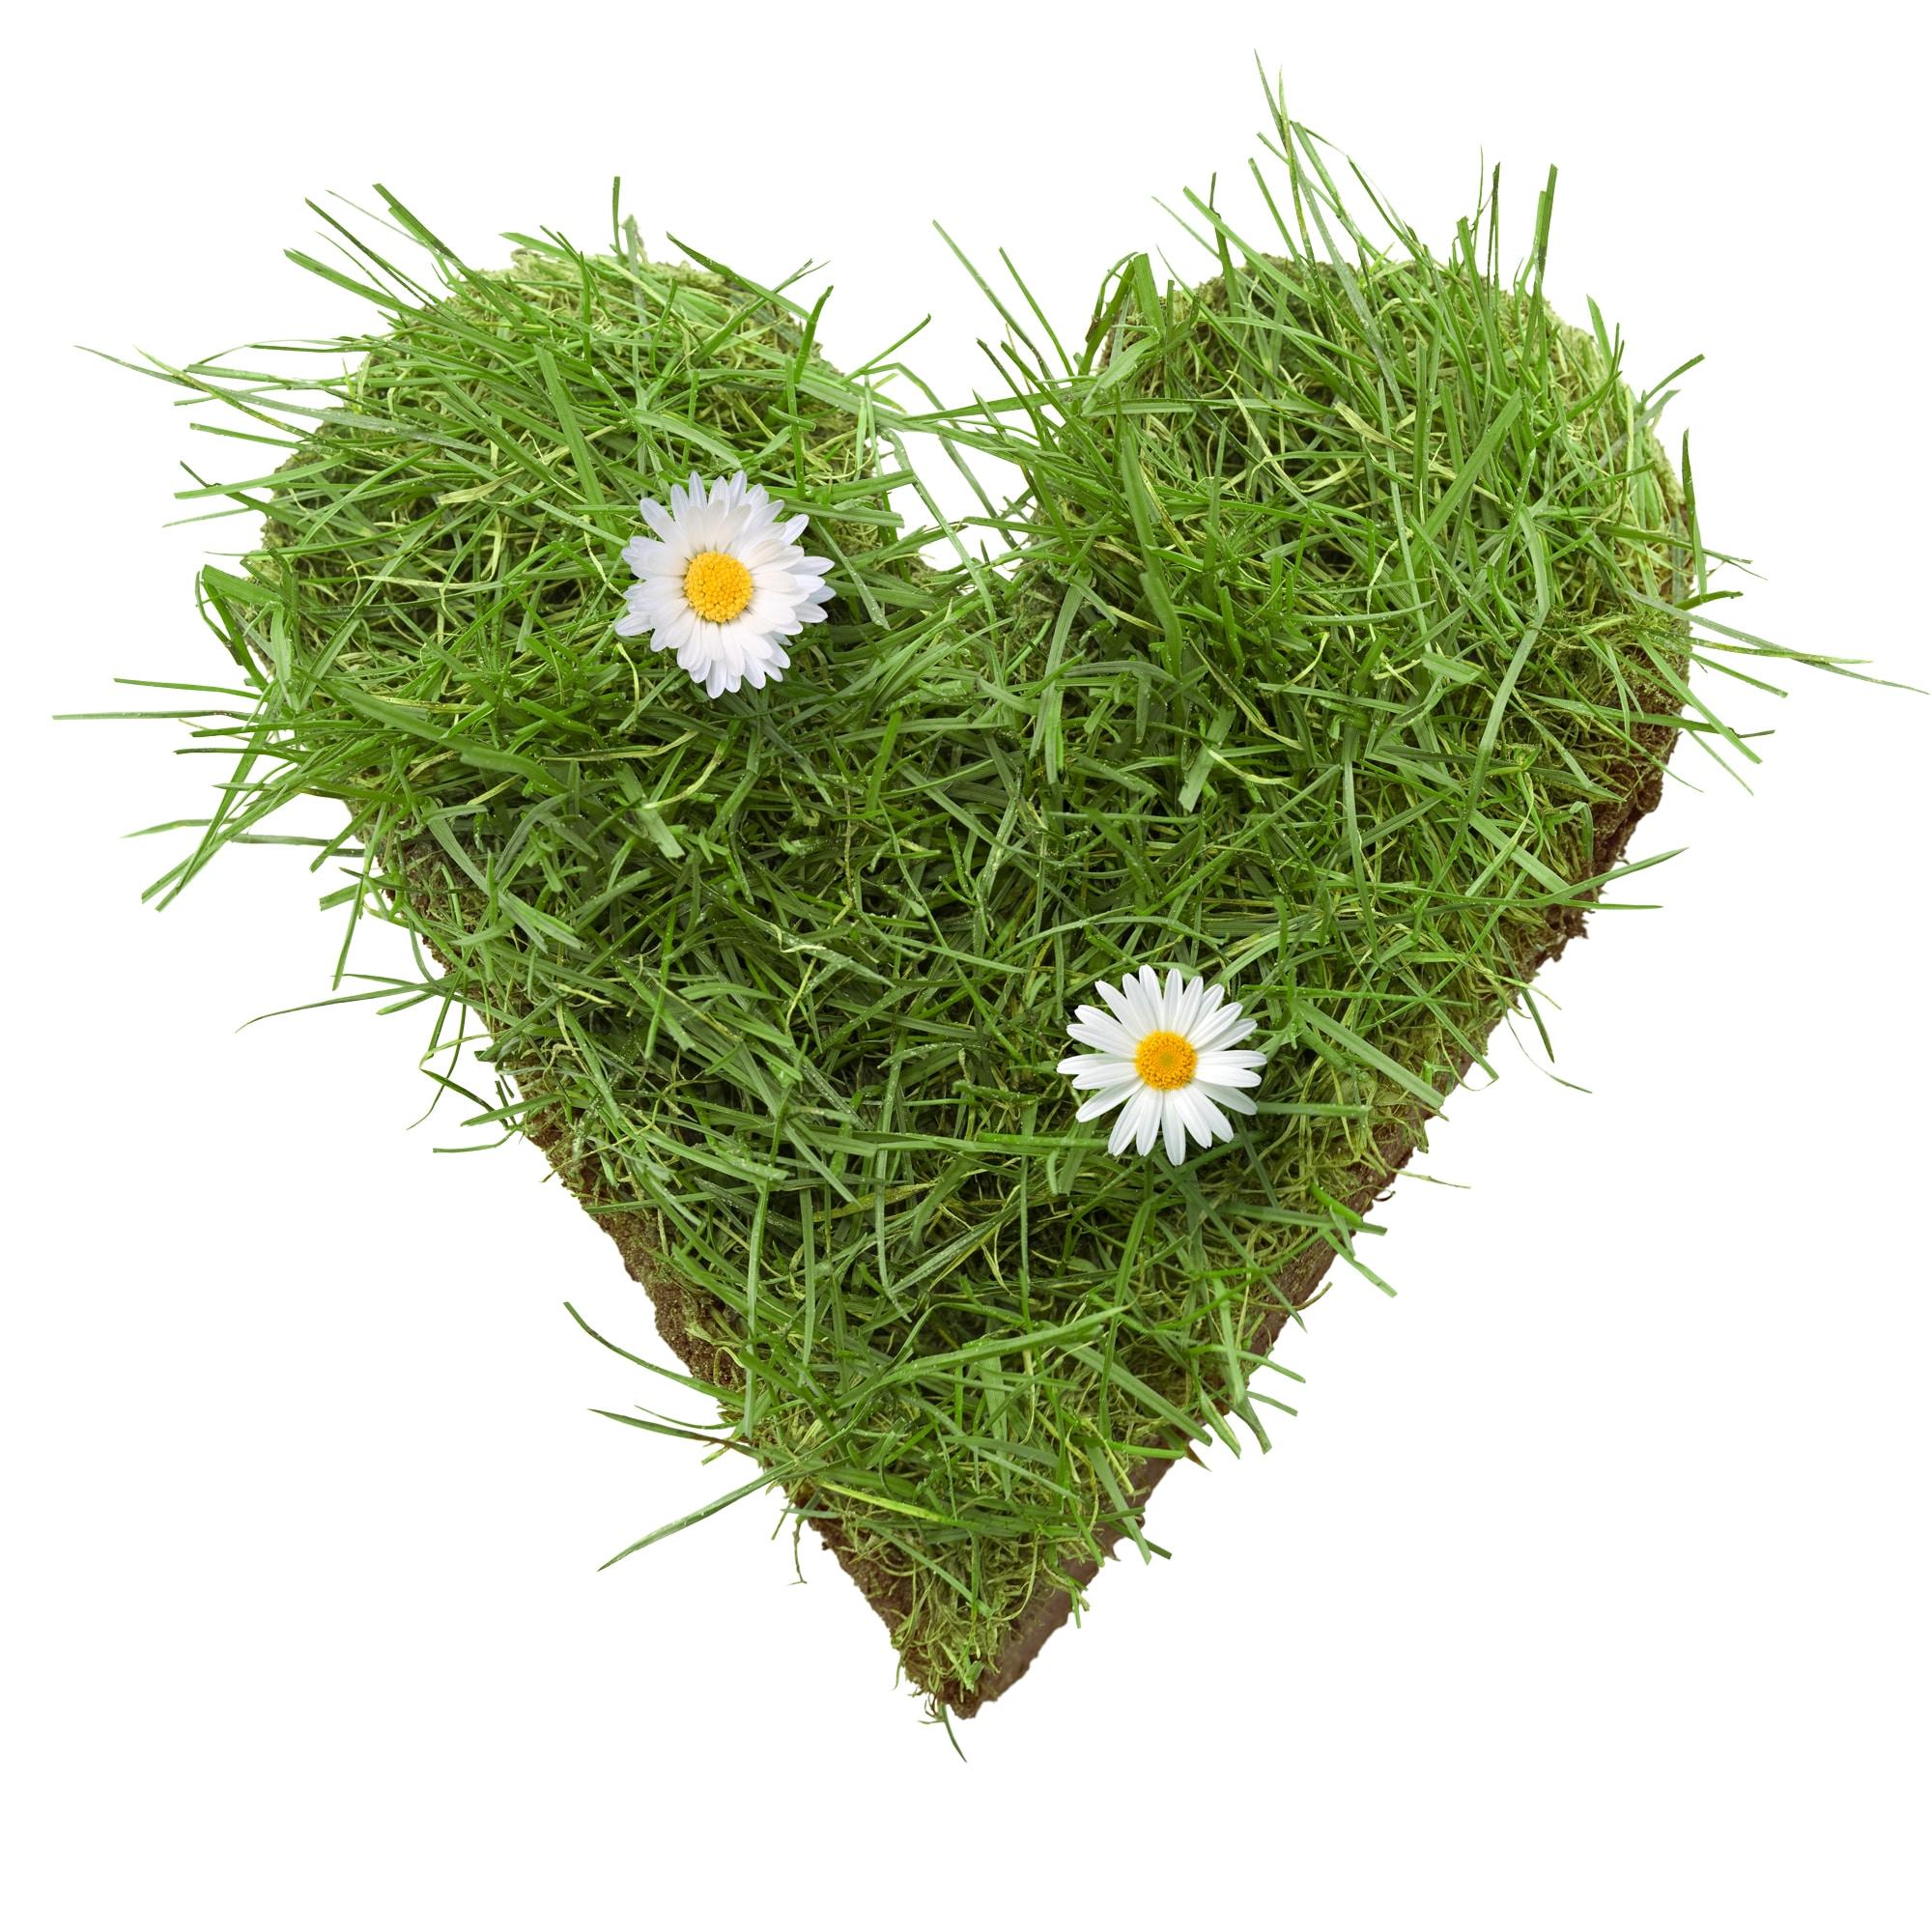 gras hart | Hart van gras - Noord-Hollandse graskaas